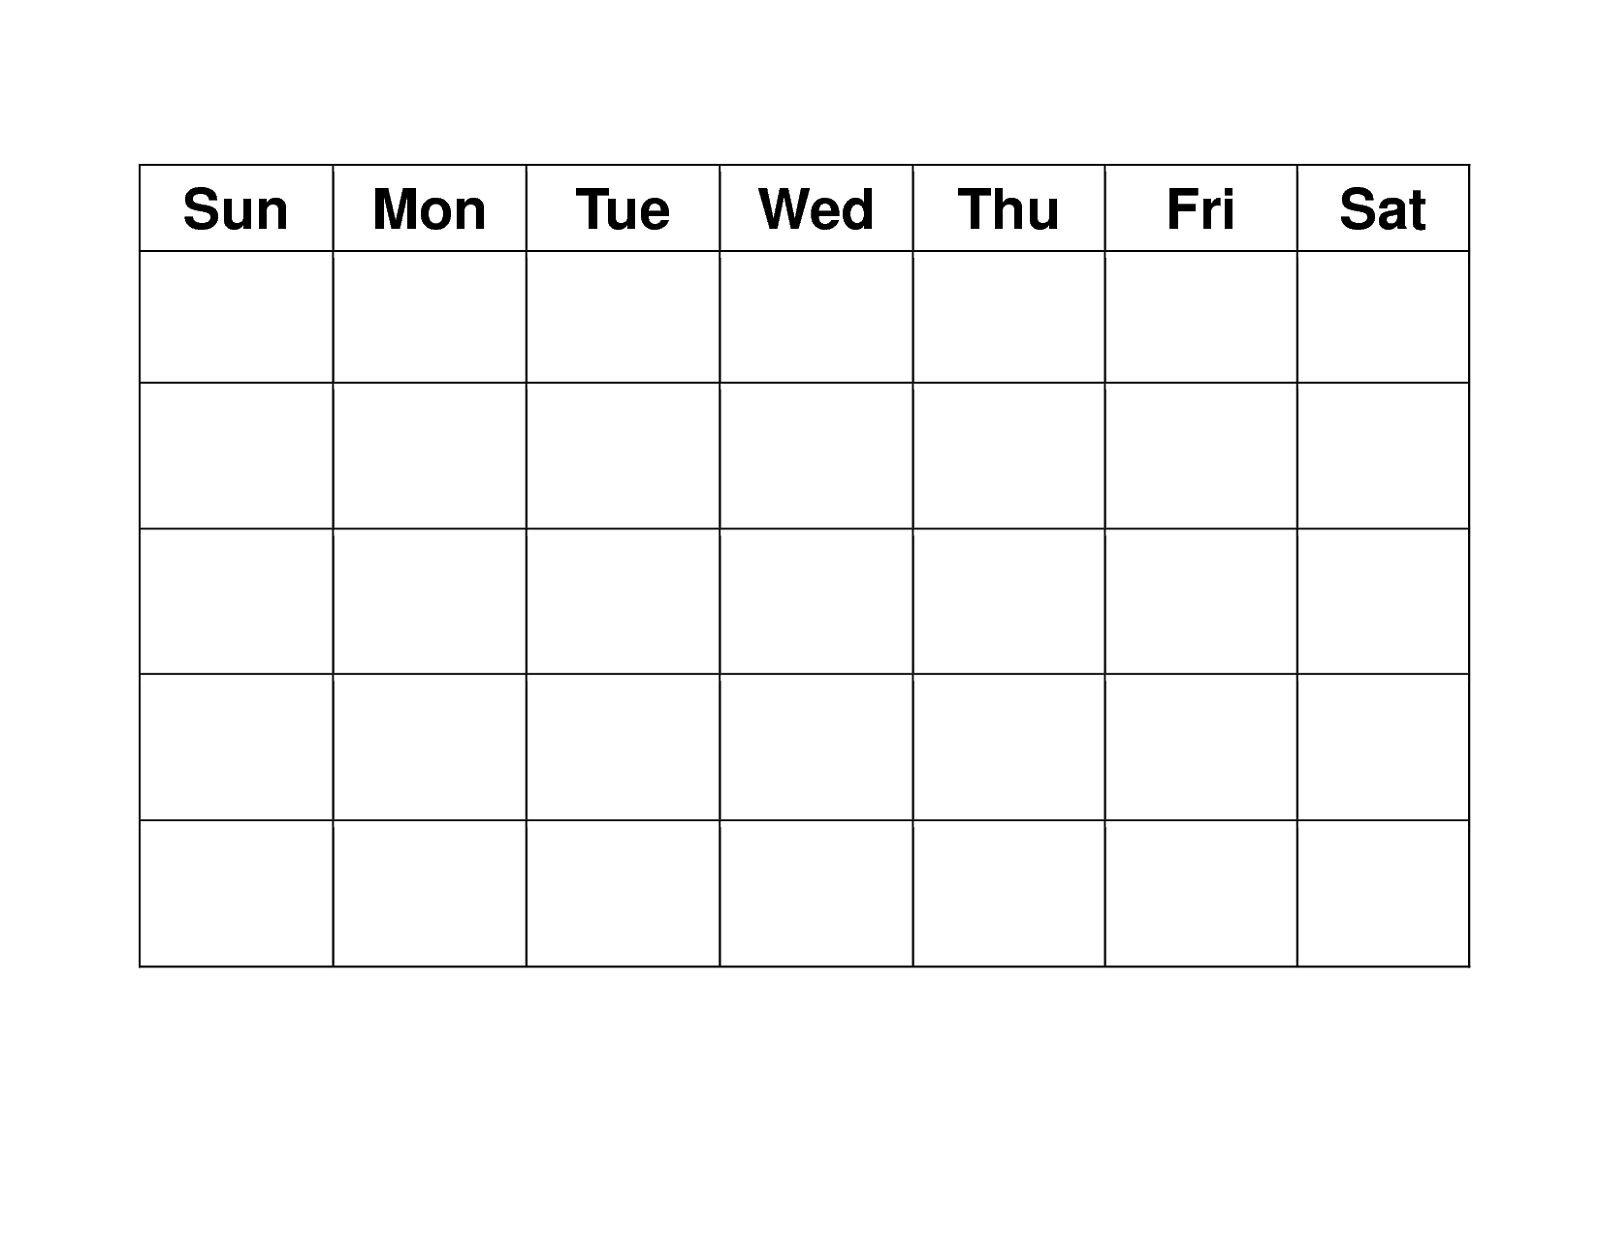 Get Blank Weekly Calendar To Fill In | Blank Calendar Fill In Weekly Schedule